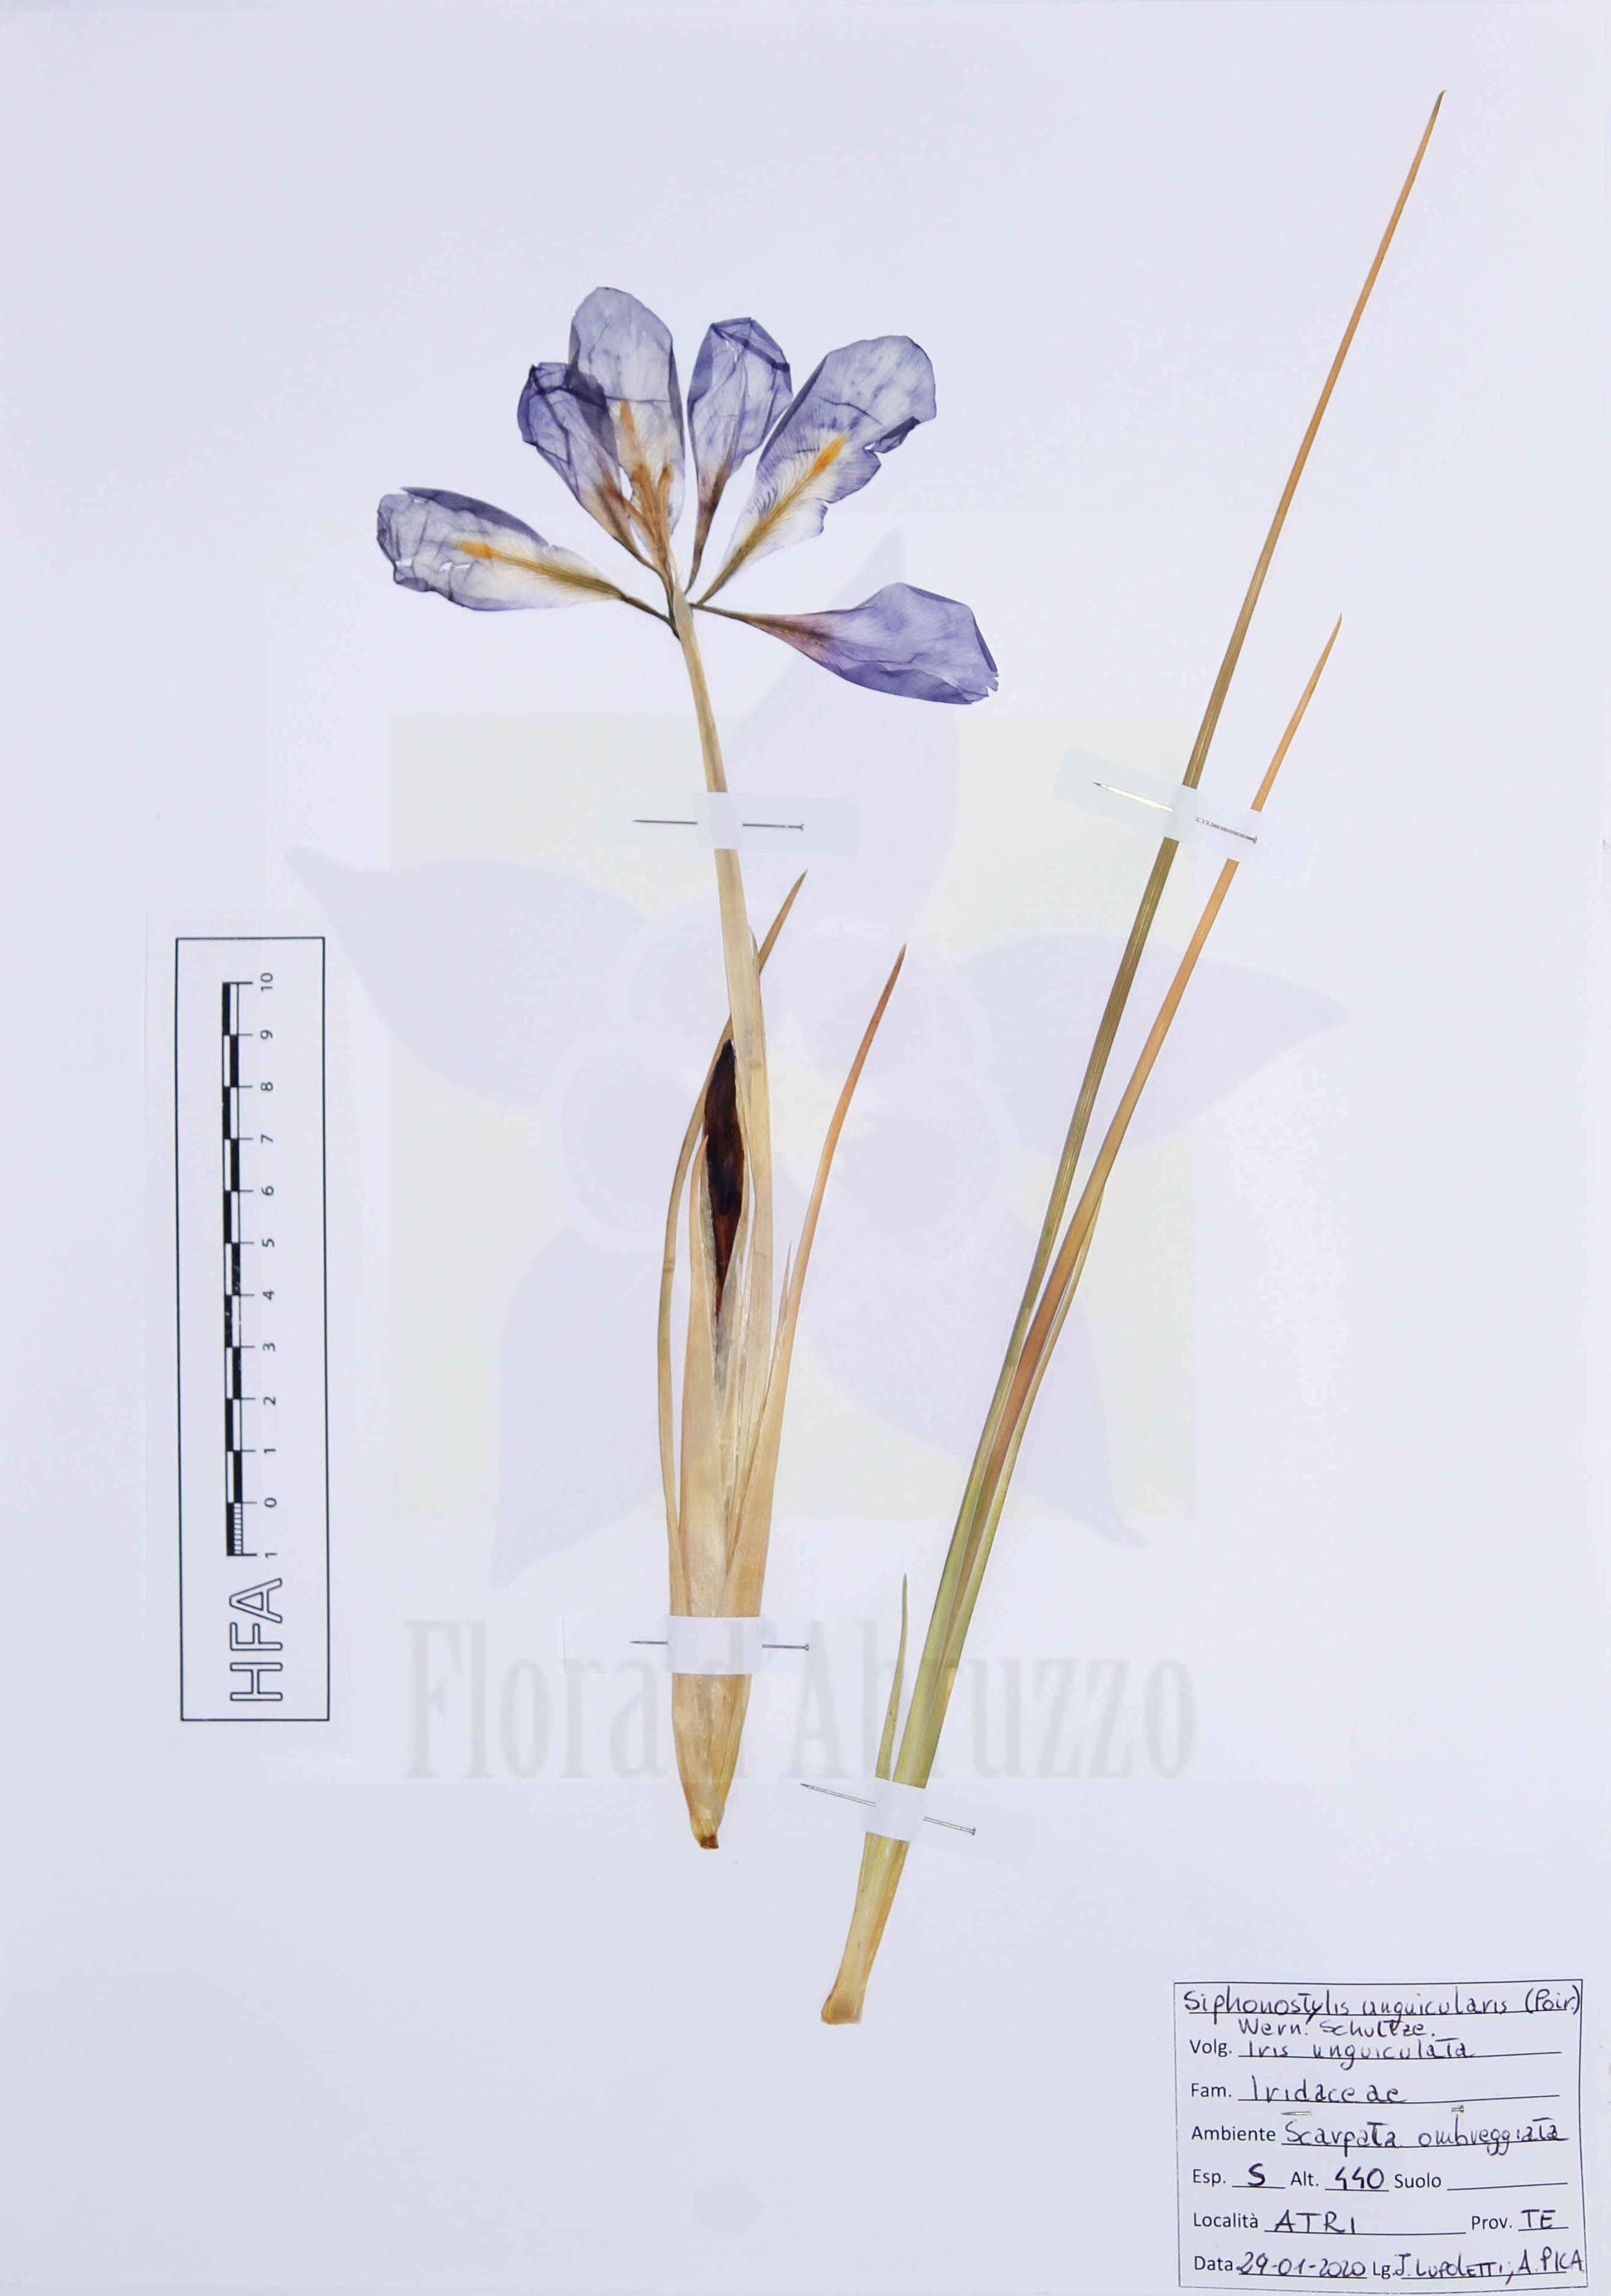 Siphonostylis unguicularis (Poir.) Wern.Schulze